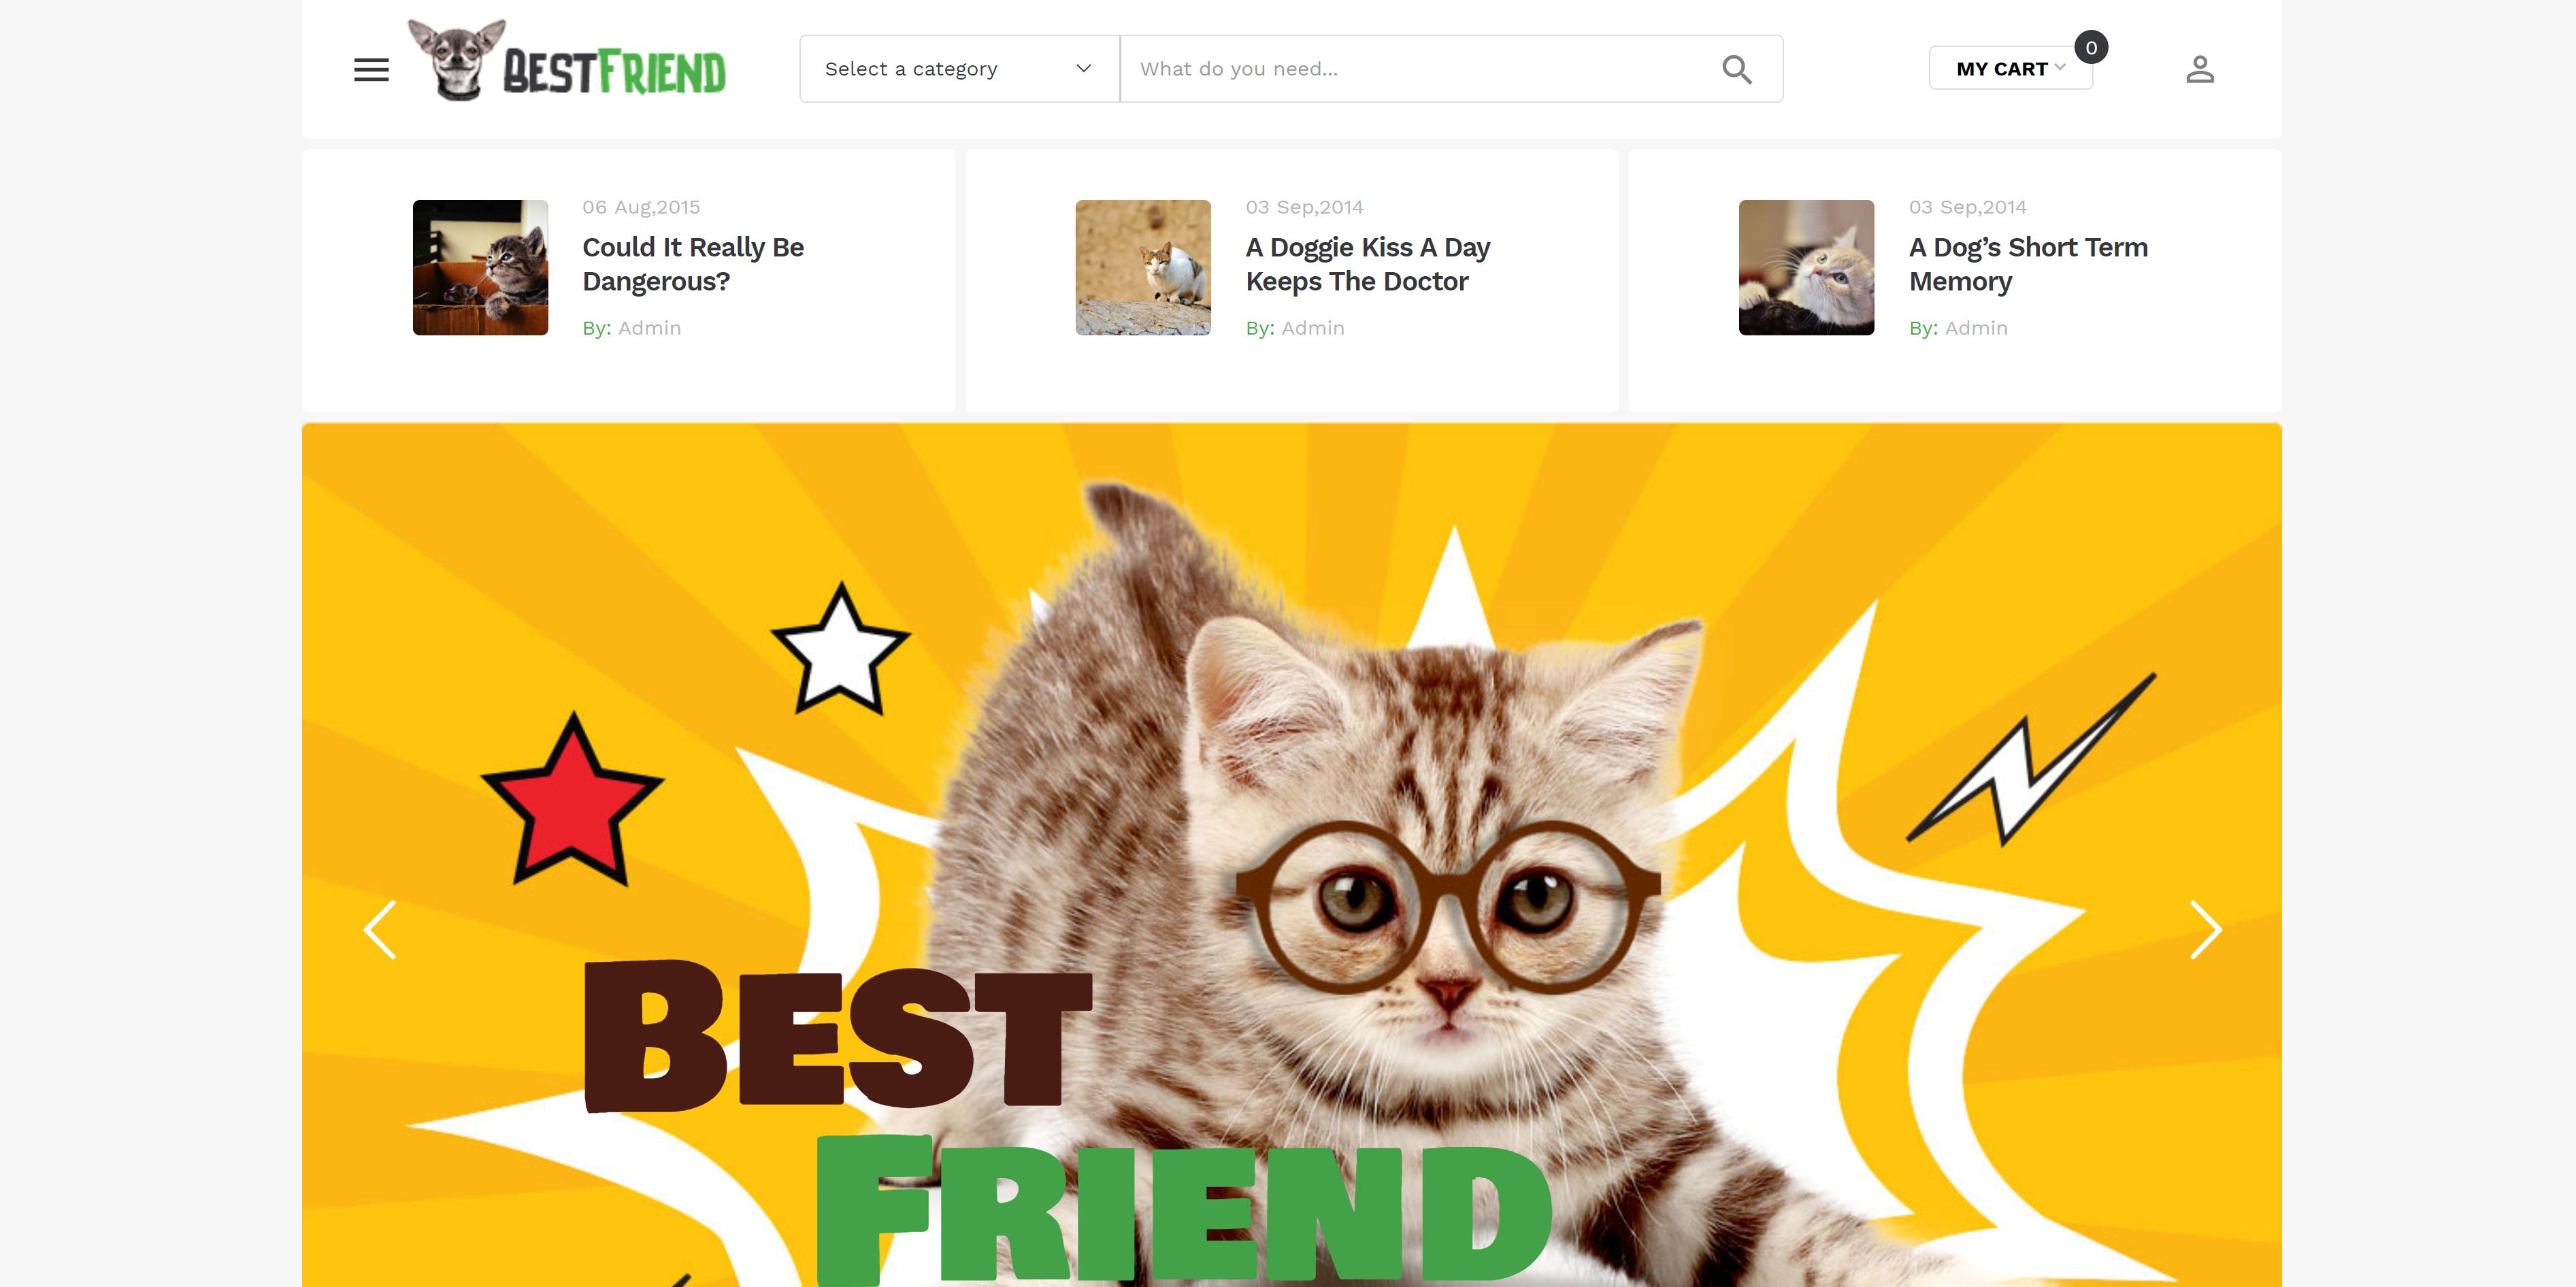 Bestfriend - Pet Shop